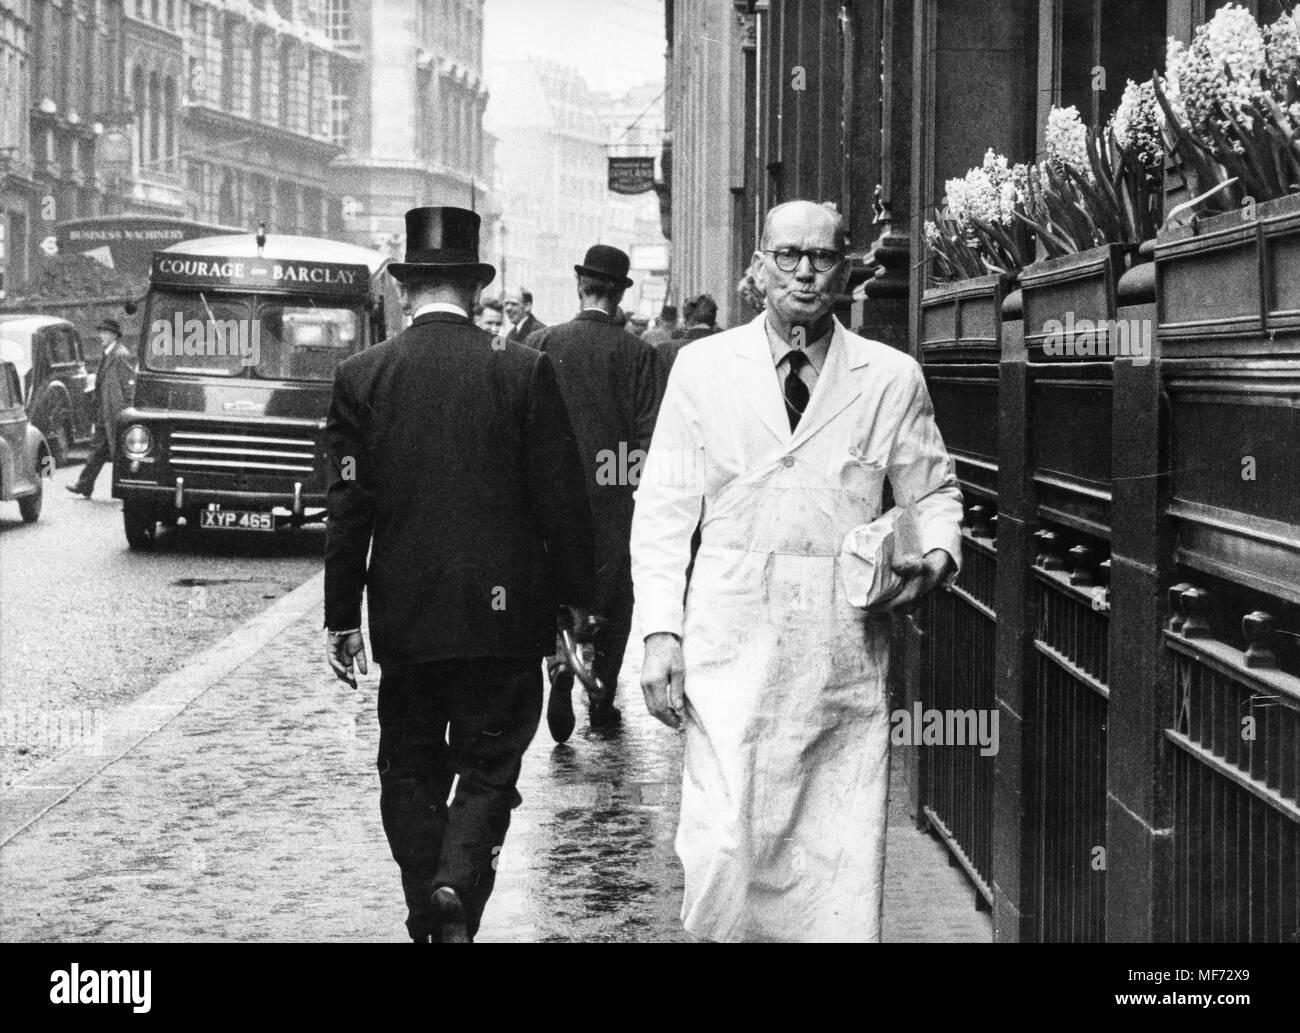 london, 70s - Stock Image